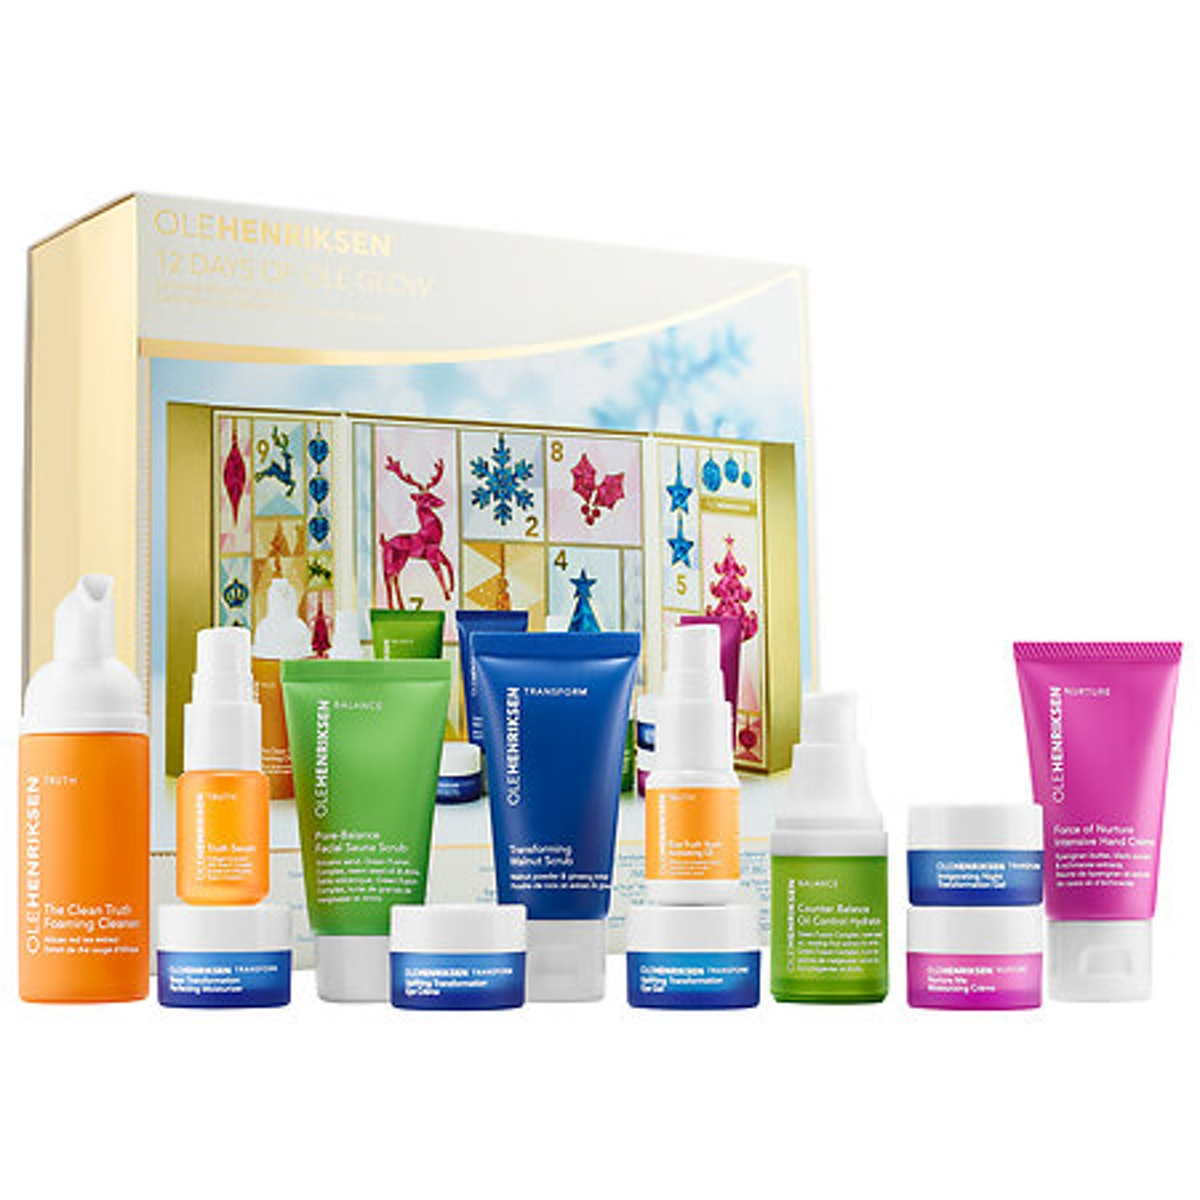 OLEHENRIKSEN 12 Days of OLE Glow Skincare Advent Calendar